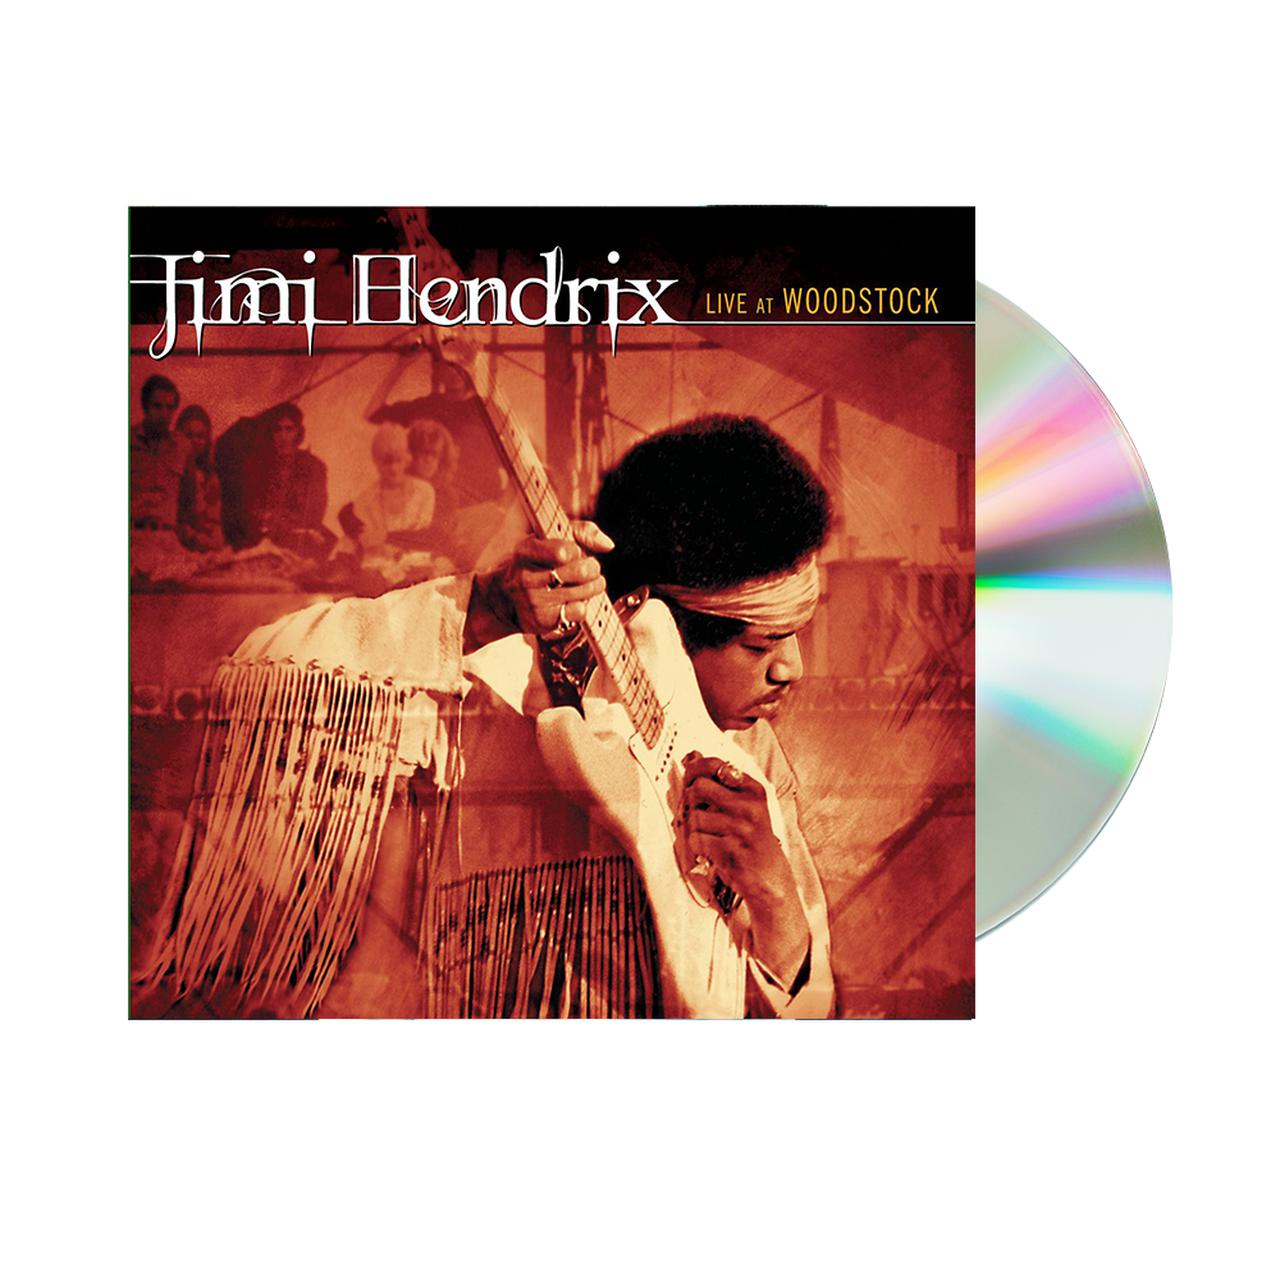 Jimi Hendrix Live At Woodstock 2CD